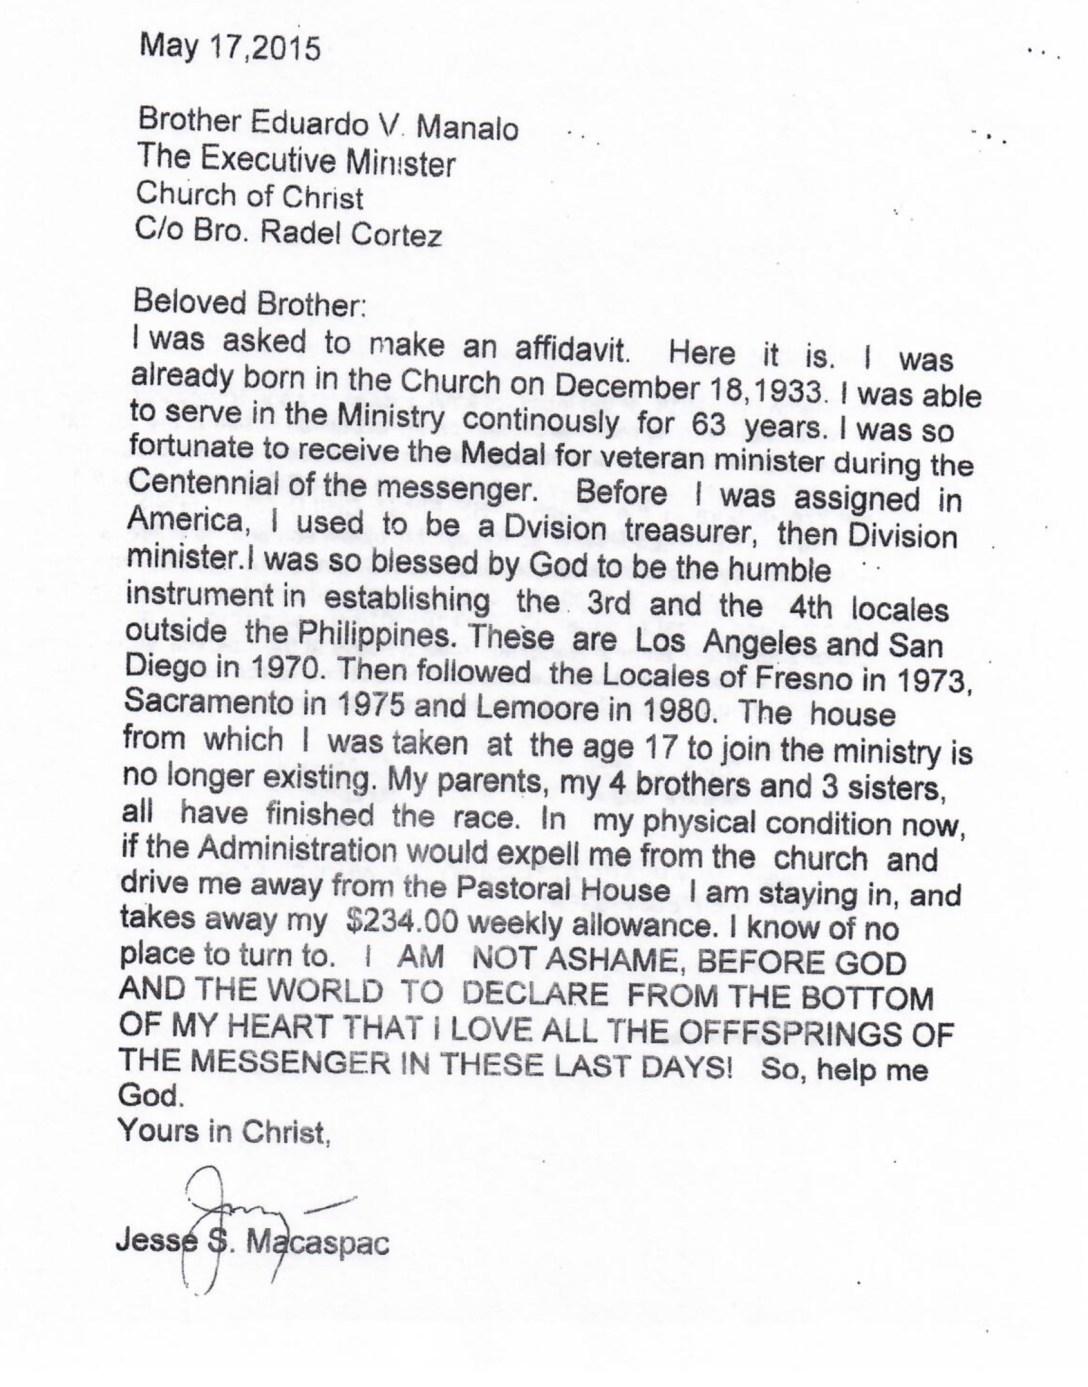 Bro. Jesse Macaspac Letter-5.jpeg